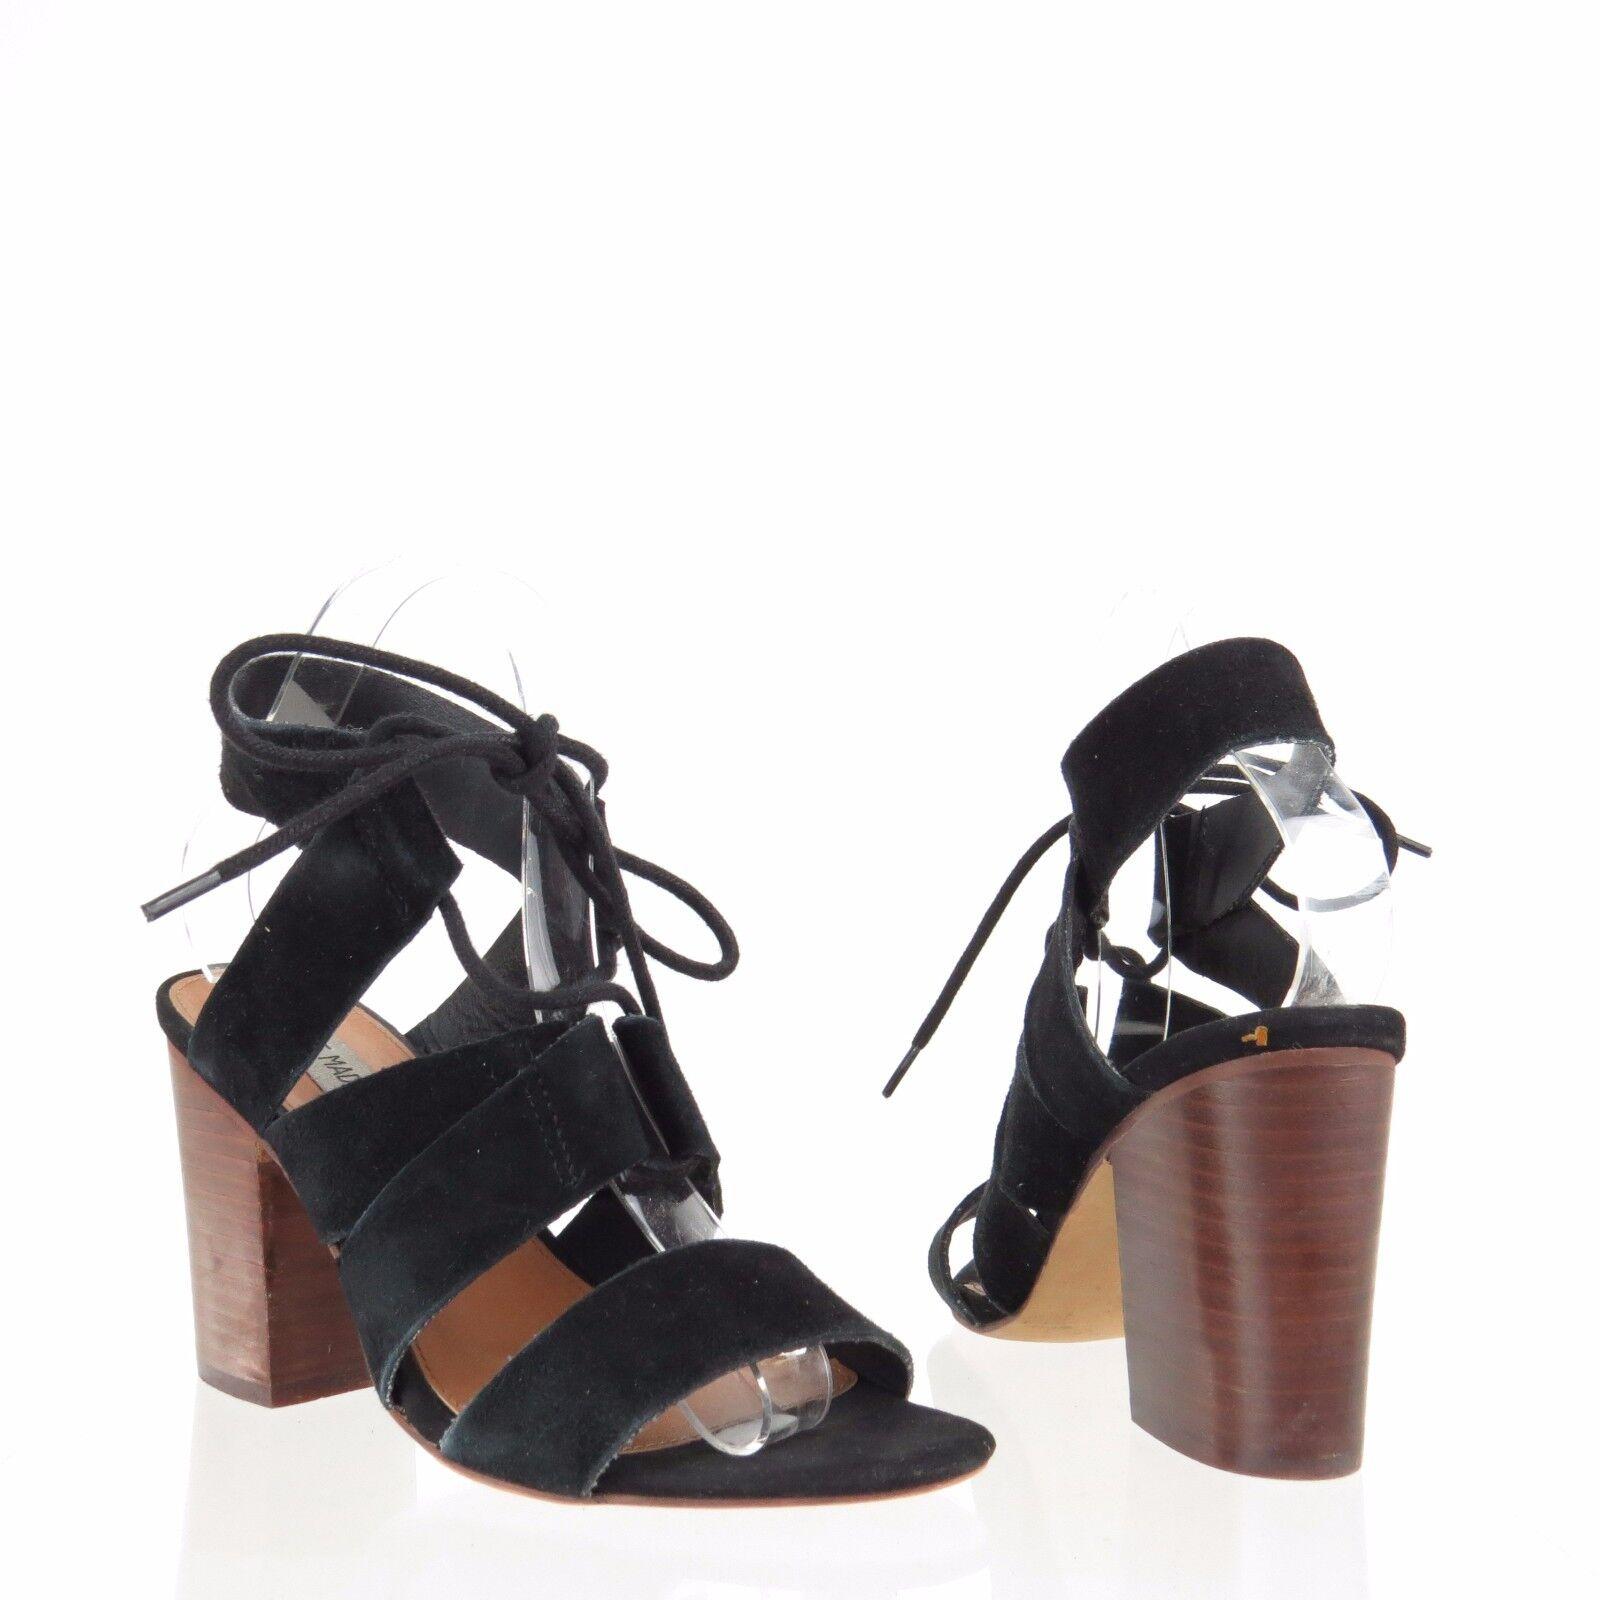 Women's Black Steve Madden Emalena Shoes Black Women's Suede Sandal Heels Size 7 M 280e66